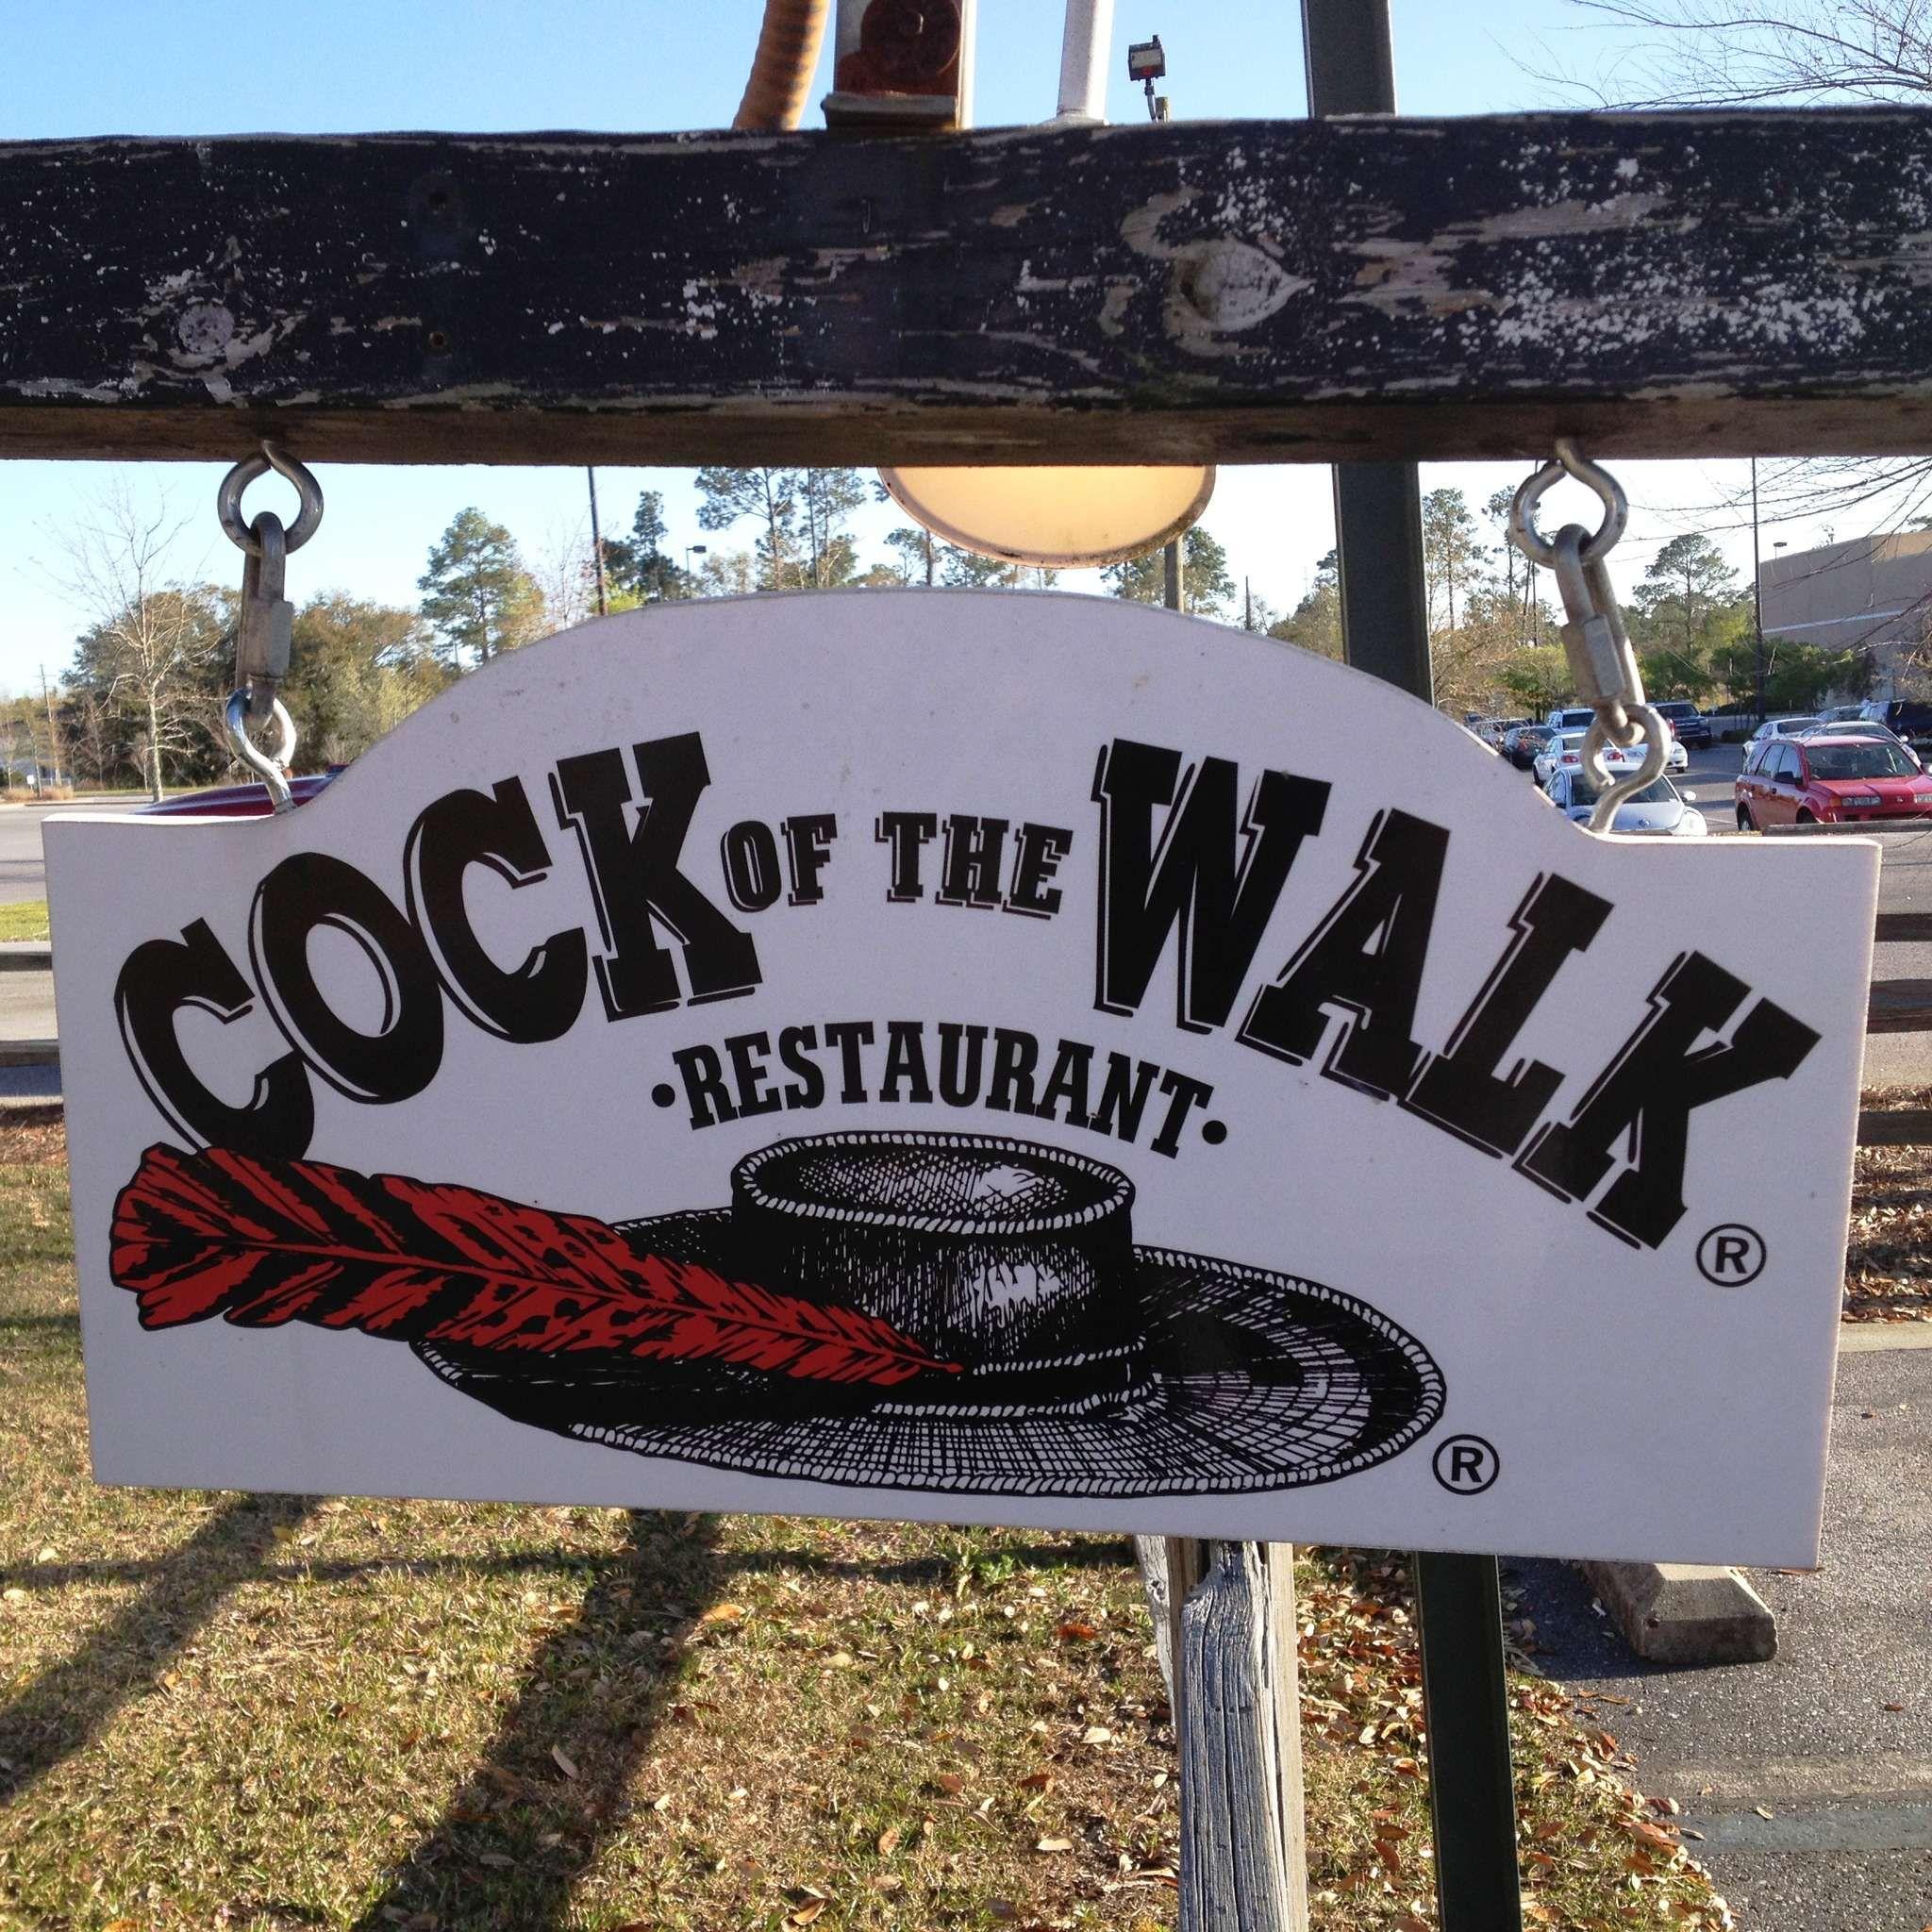 Cock of the walk restaurant pensacola